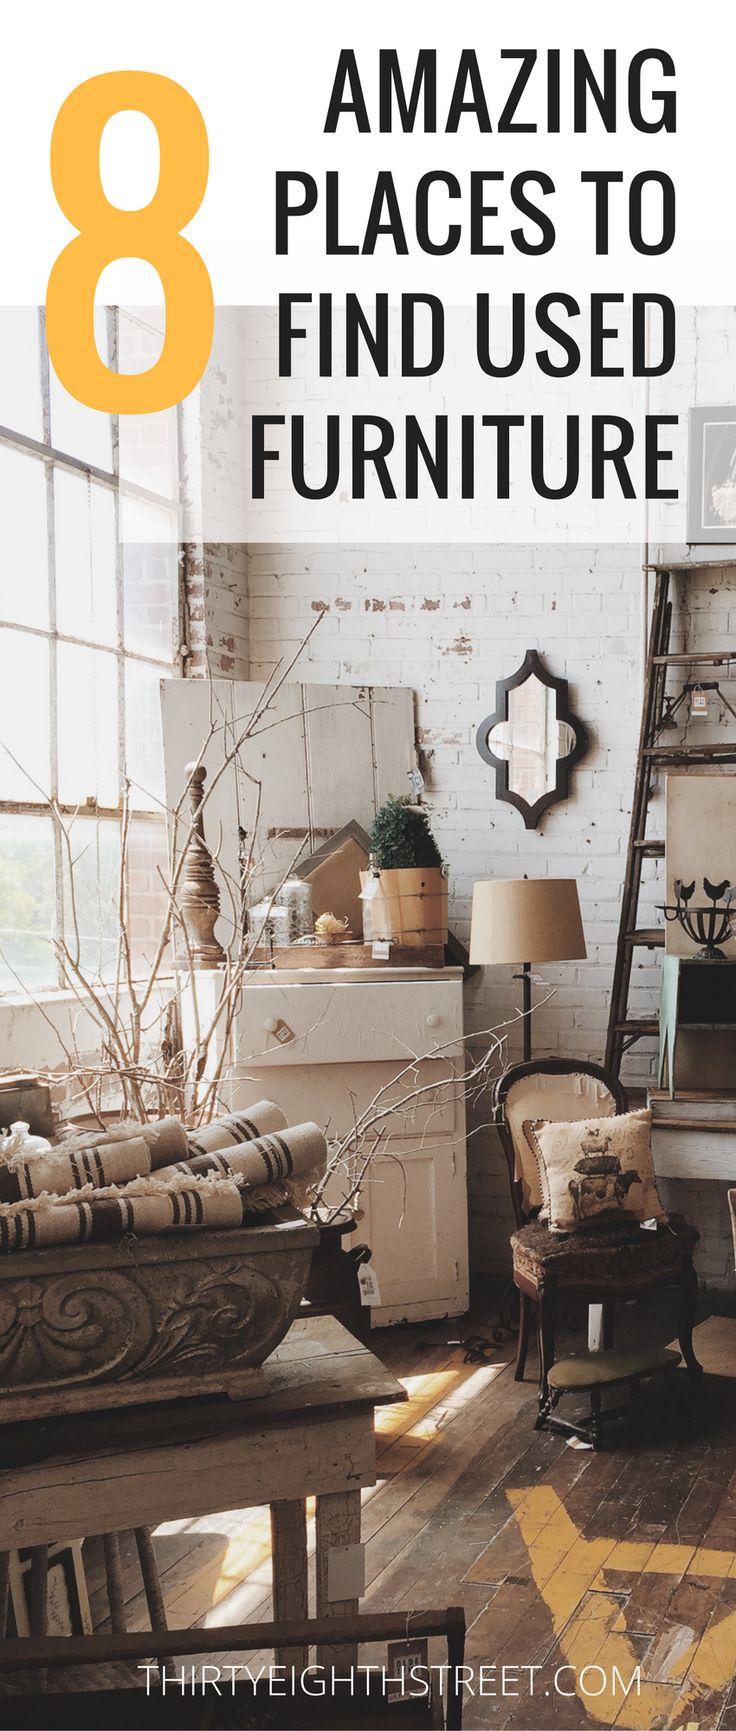 Find Used Furniture 1464 best furniture diys - home and diy group images on pinterest